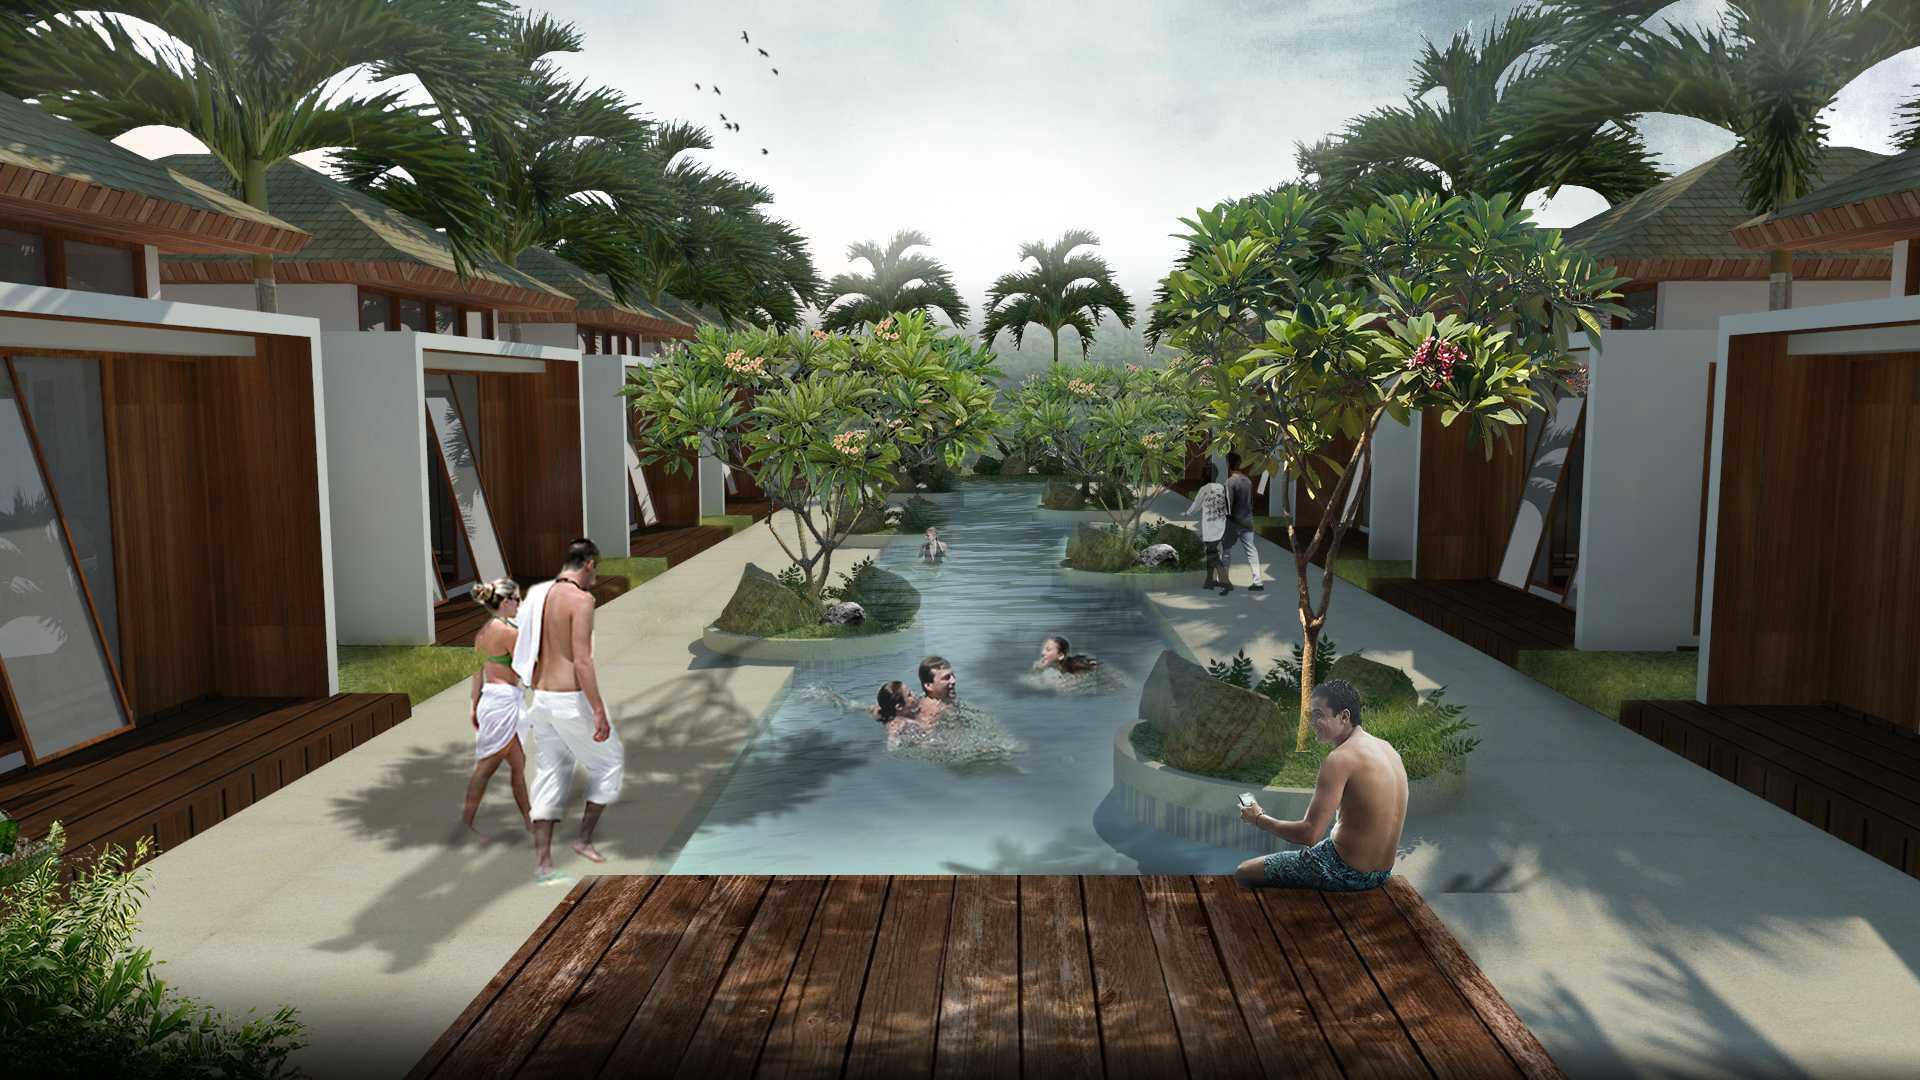 Alima Studio One Ungasan Resort Ungasan, Kuta Sel., Kabupaten Badung, Bali, Indonesia Ungasan, Kuta Sel., Kabupaten Badung, Bali, Indonesia Alima-Studio-One-Ungasan-Resort  57474